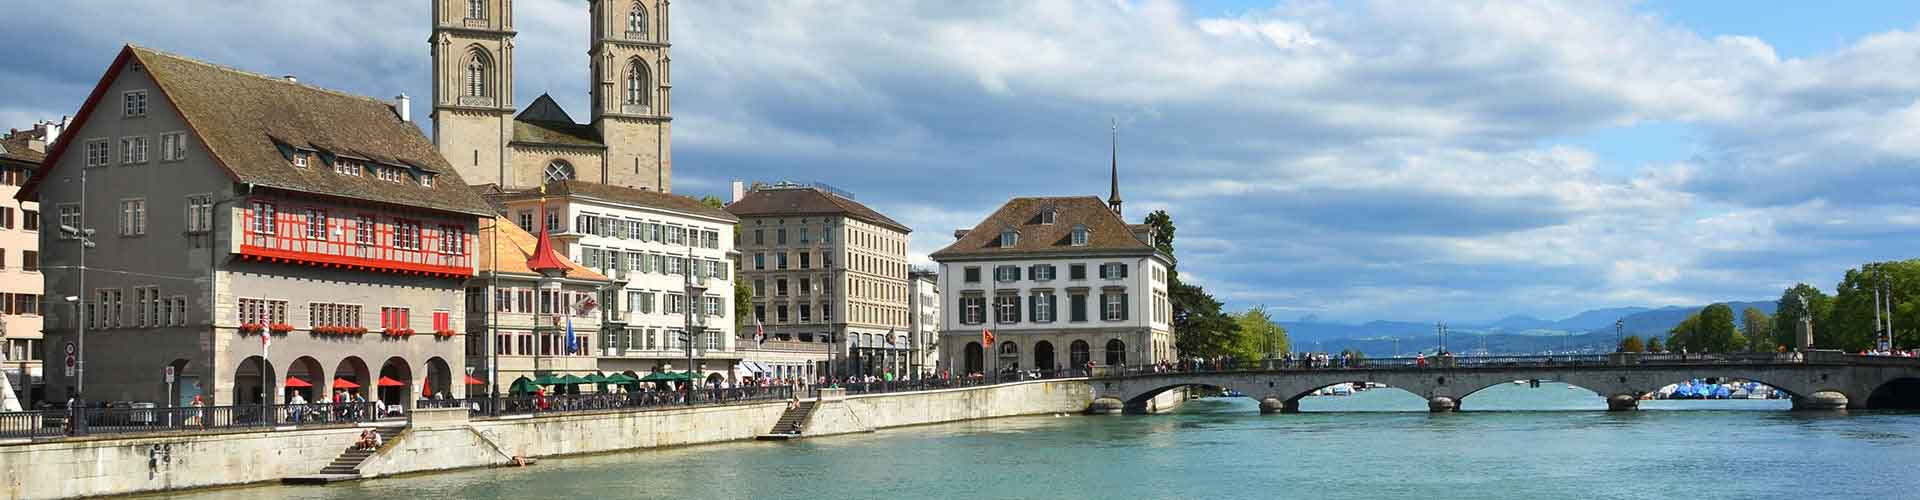 Zurique – Camping em Zurique. Mapas para Zurique, Fotos e Avaliações para cada camping em Zurique.